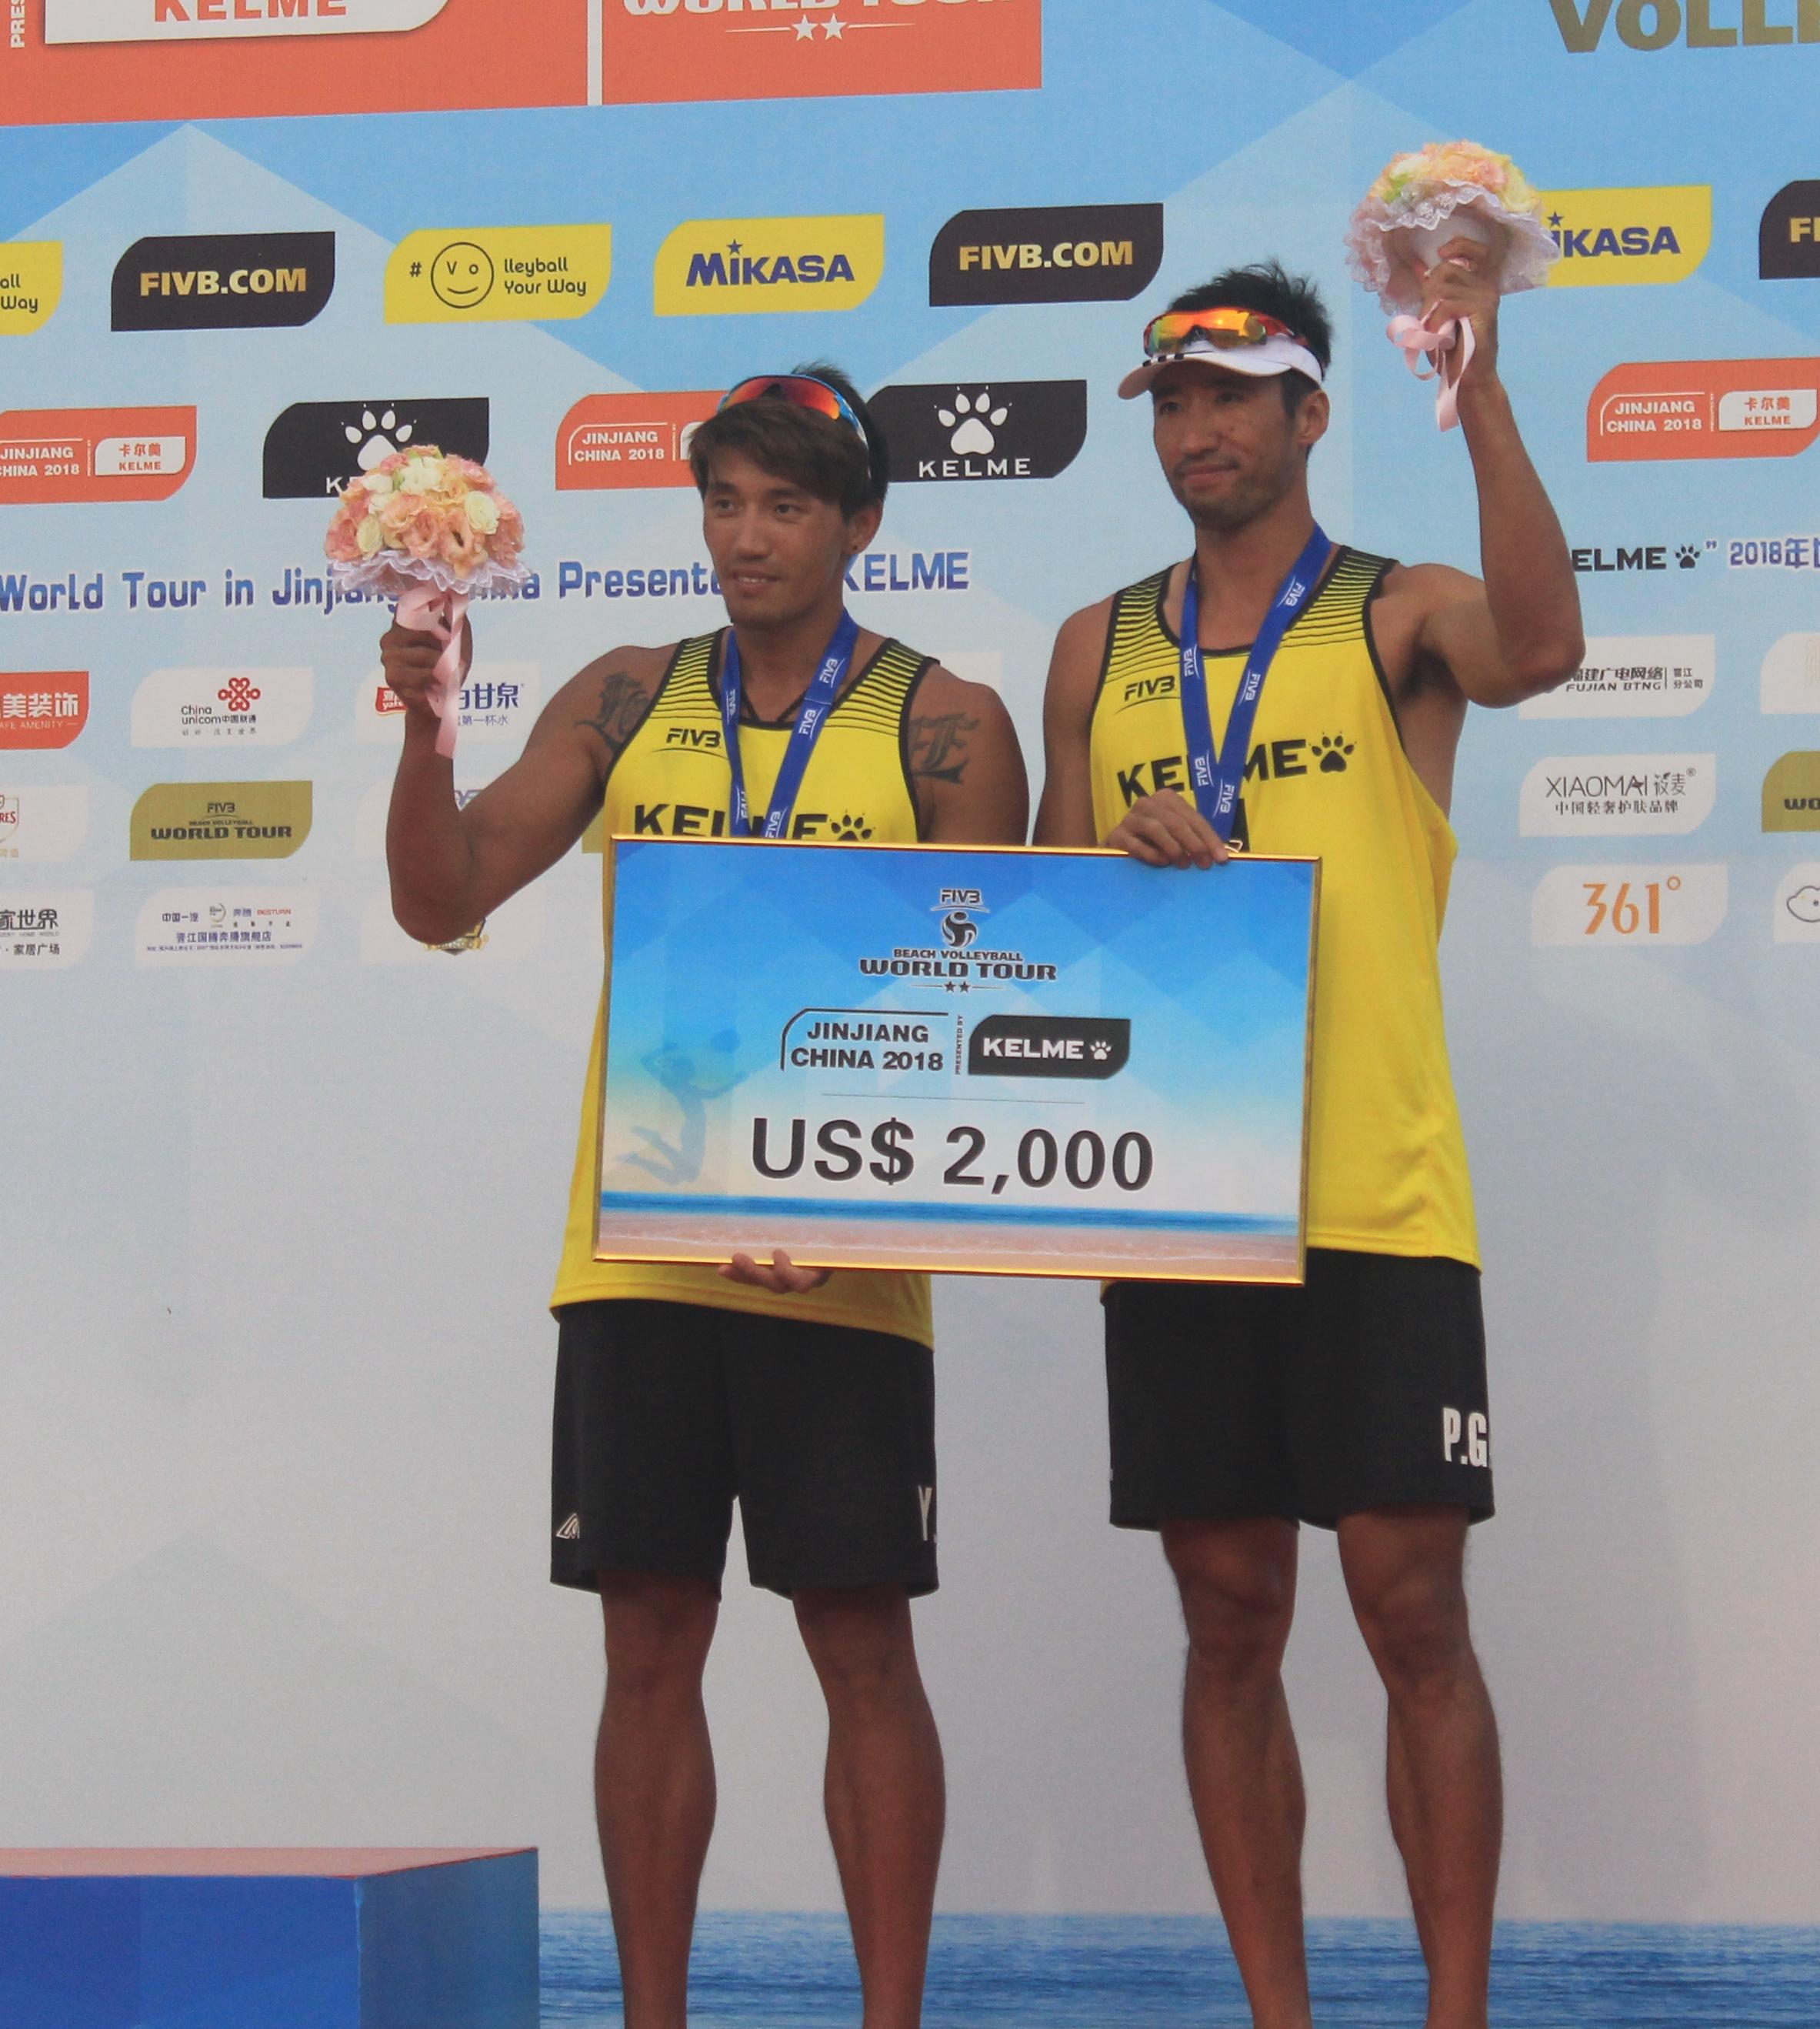 News - FIVB World Return returns to Asia